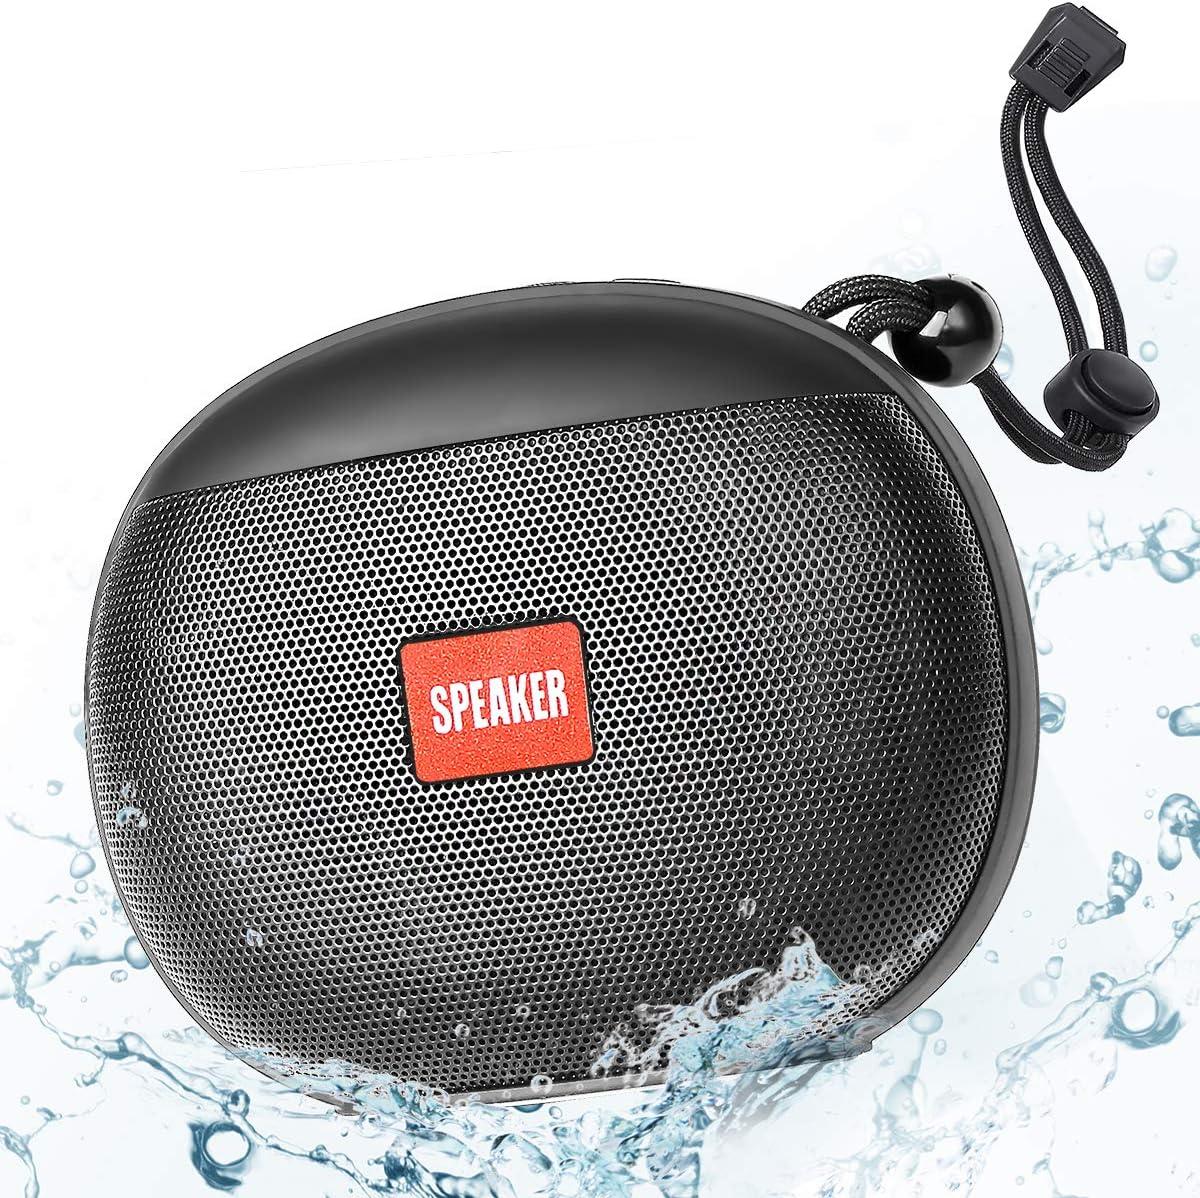 Altavoces Bluetooth Ducha, Altavoz Bluetooth Portatiles, Altavoz Bluetooth Inalámbrico 5.0 Estéreo TWS HD, 2400mAh 12 Horas de Juego, Impermeable IPX6 Micrófono incorporado soporte de radio FM TF, USB